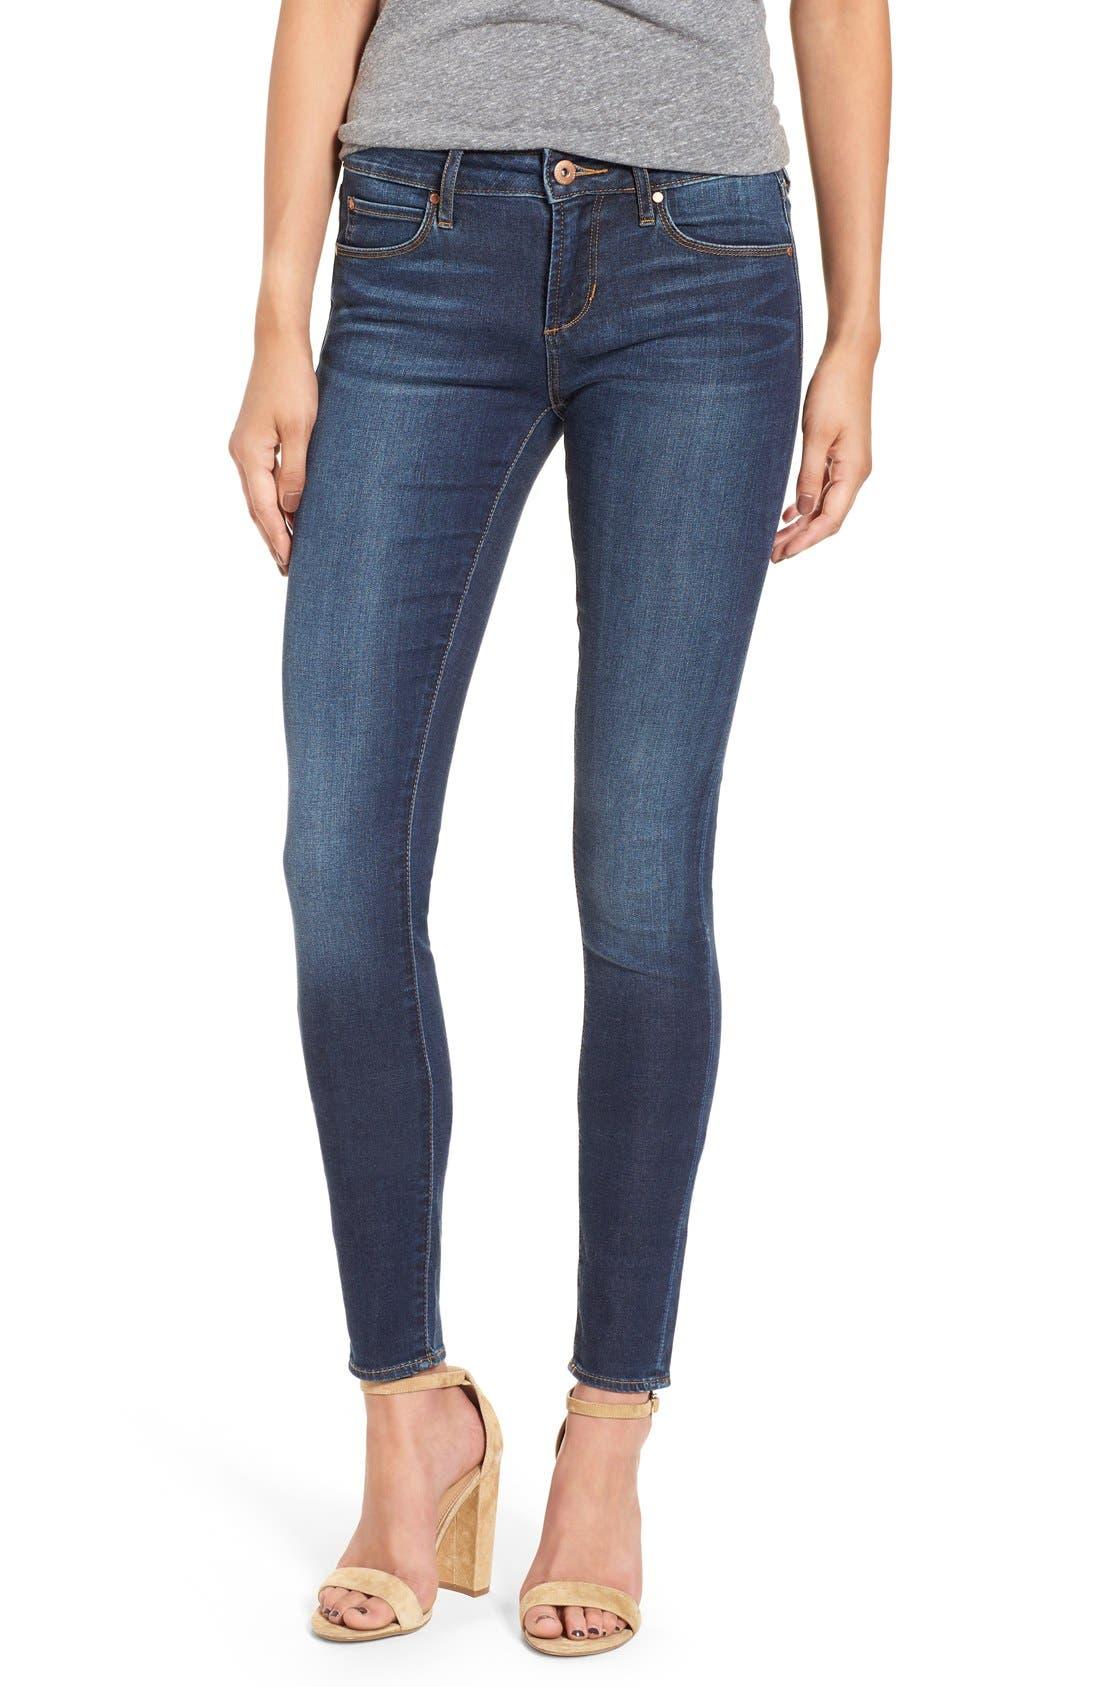 Main Image - Articles of Society 'Mya' Skinny Jeans (Glendale)